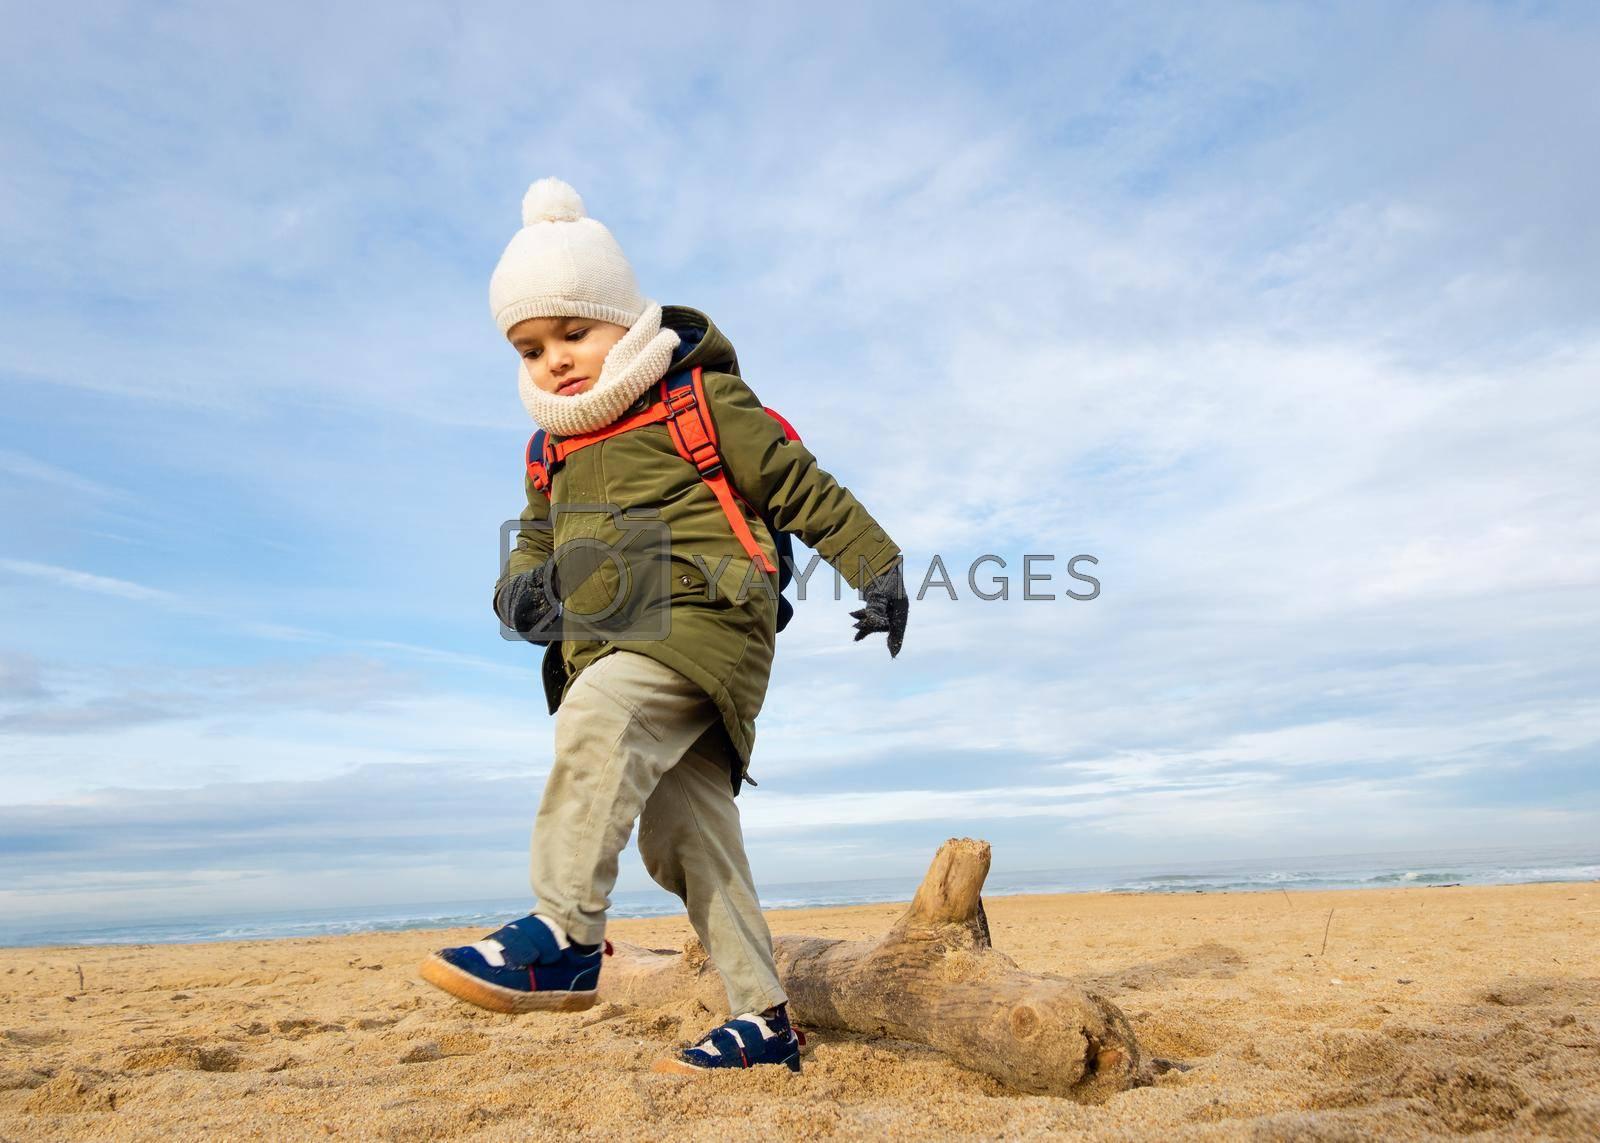 Little boy walking over a log on beach, winter season, low angle shot